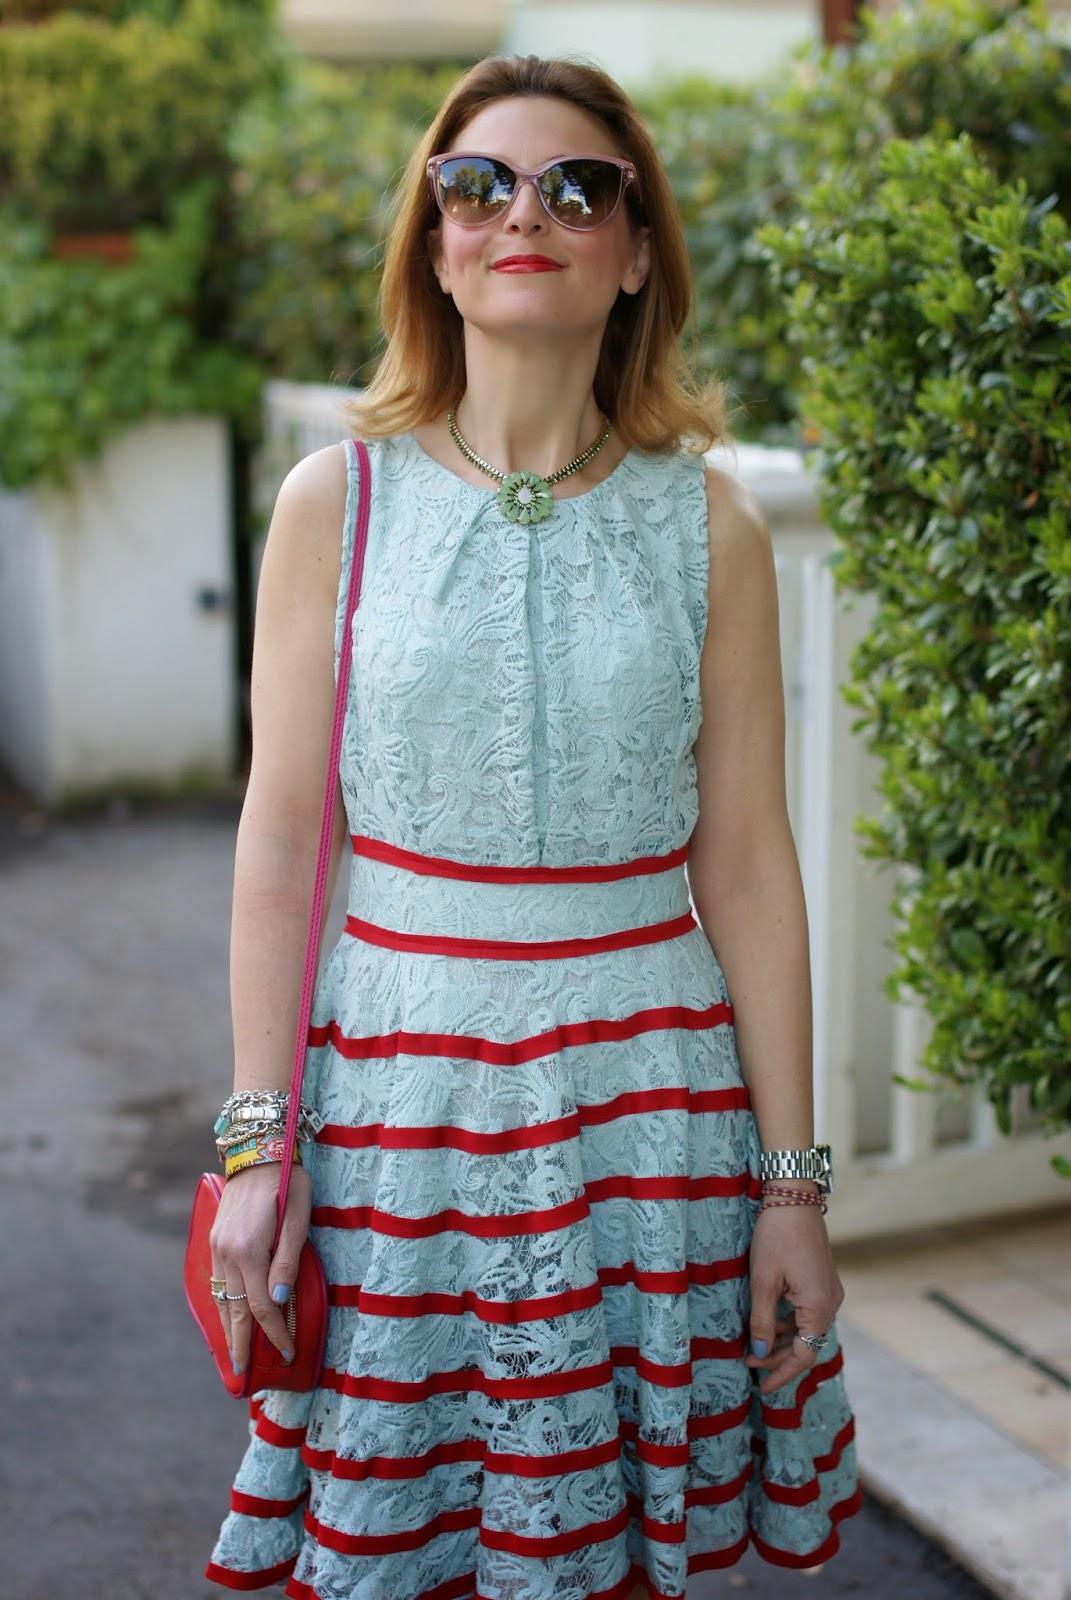 Sodini bijoux flower necklace, chicwish lace dress, bonjour bag, Fashion and Cookies, fashion blogger